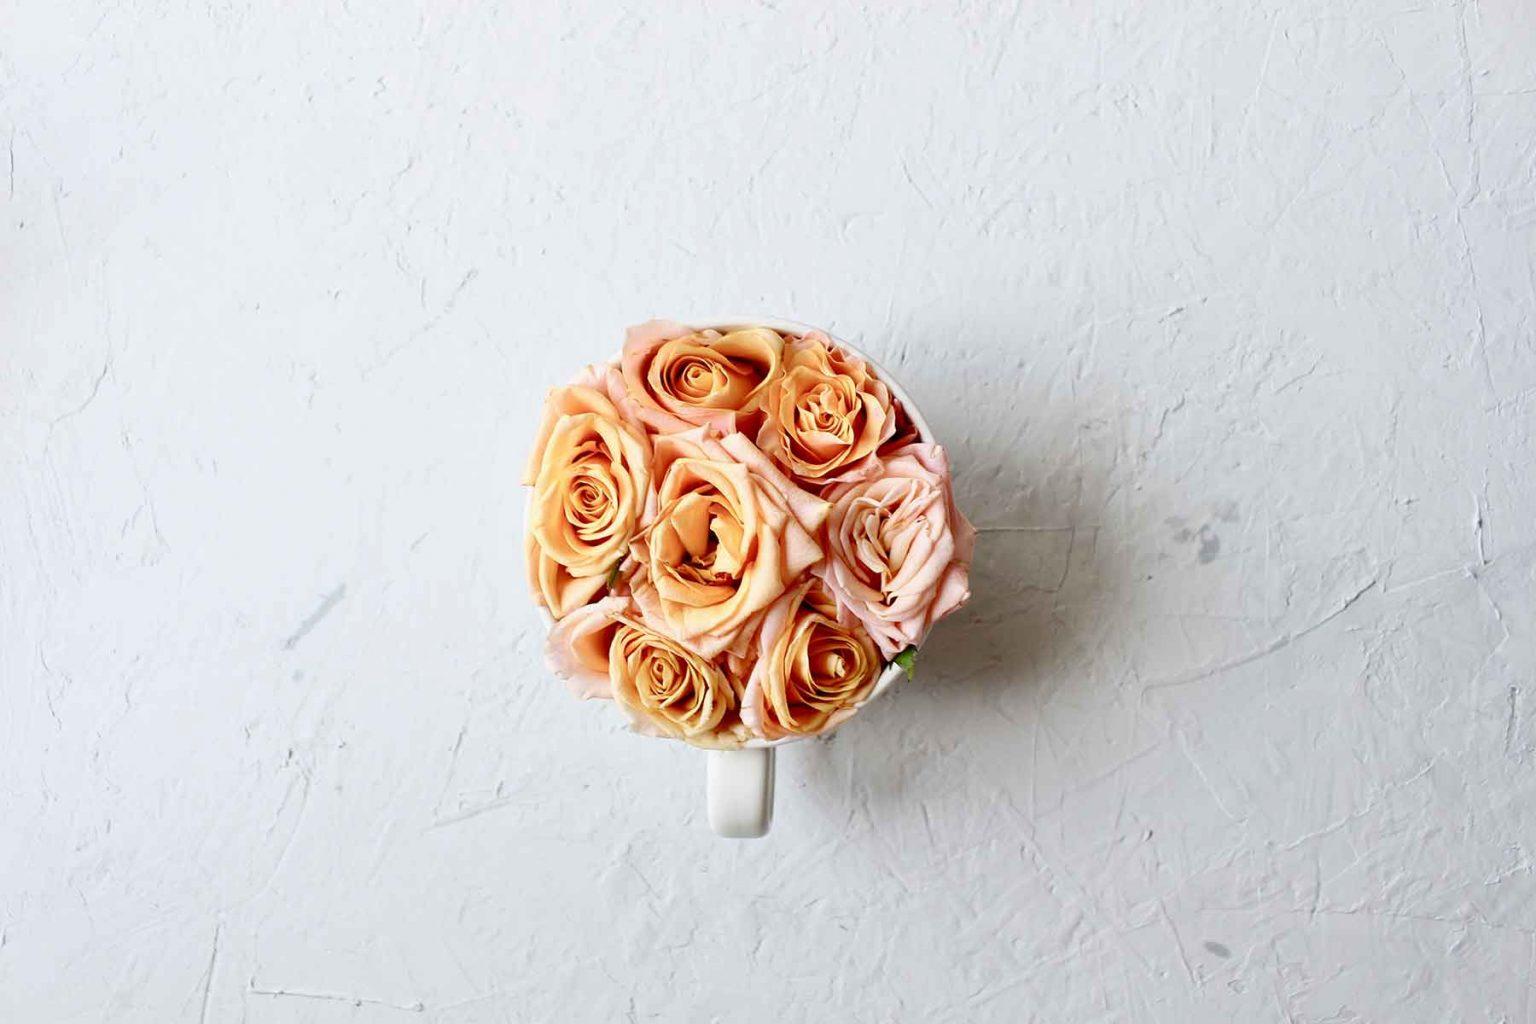 flowers-minimalistic-SPKZAHE-1.jpg